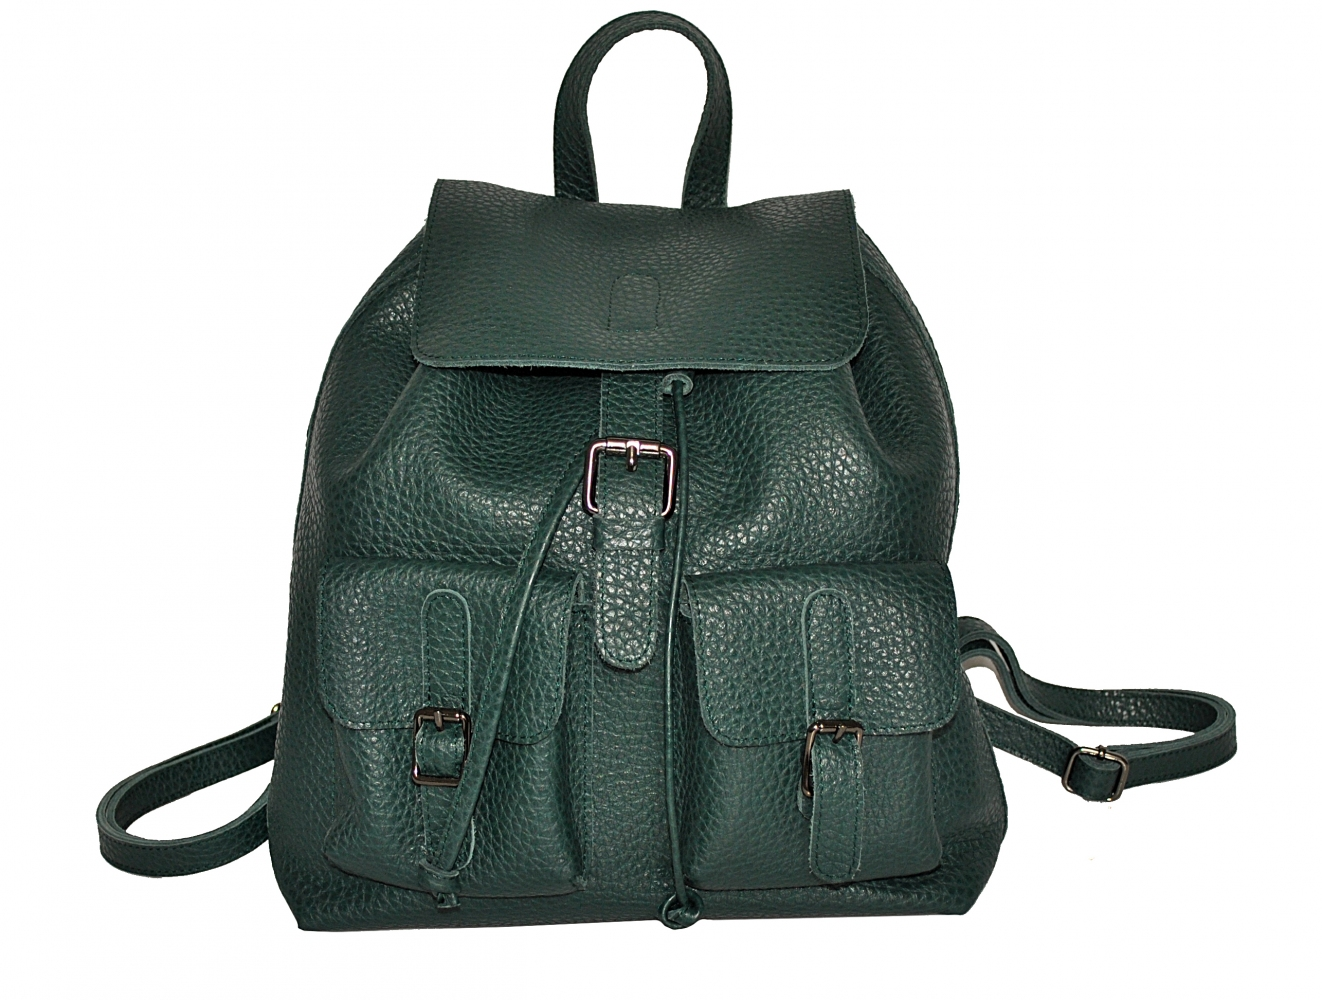 893c5343ea4f Женские рюкзаки - Женщинам - Интернет-магазин сумок MIS.ua